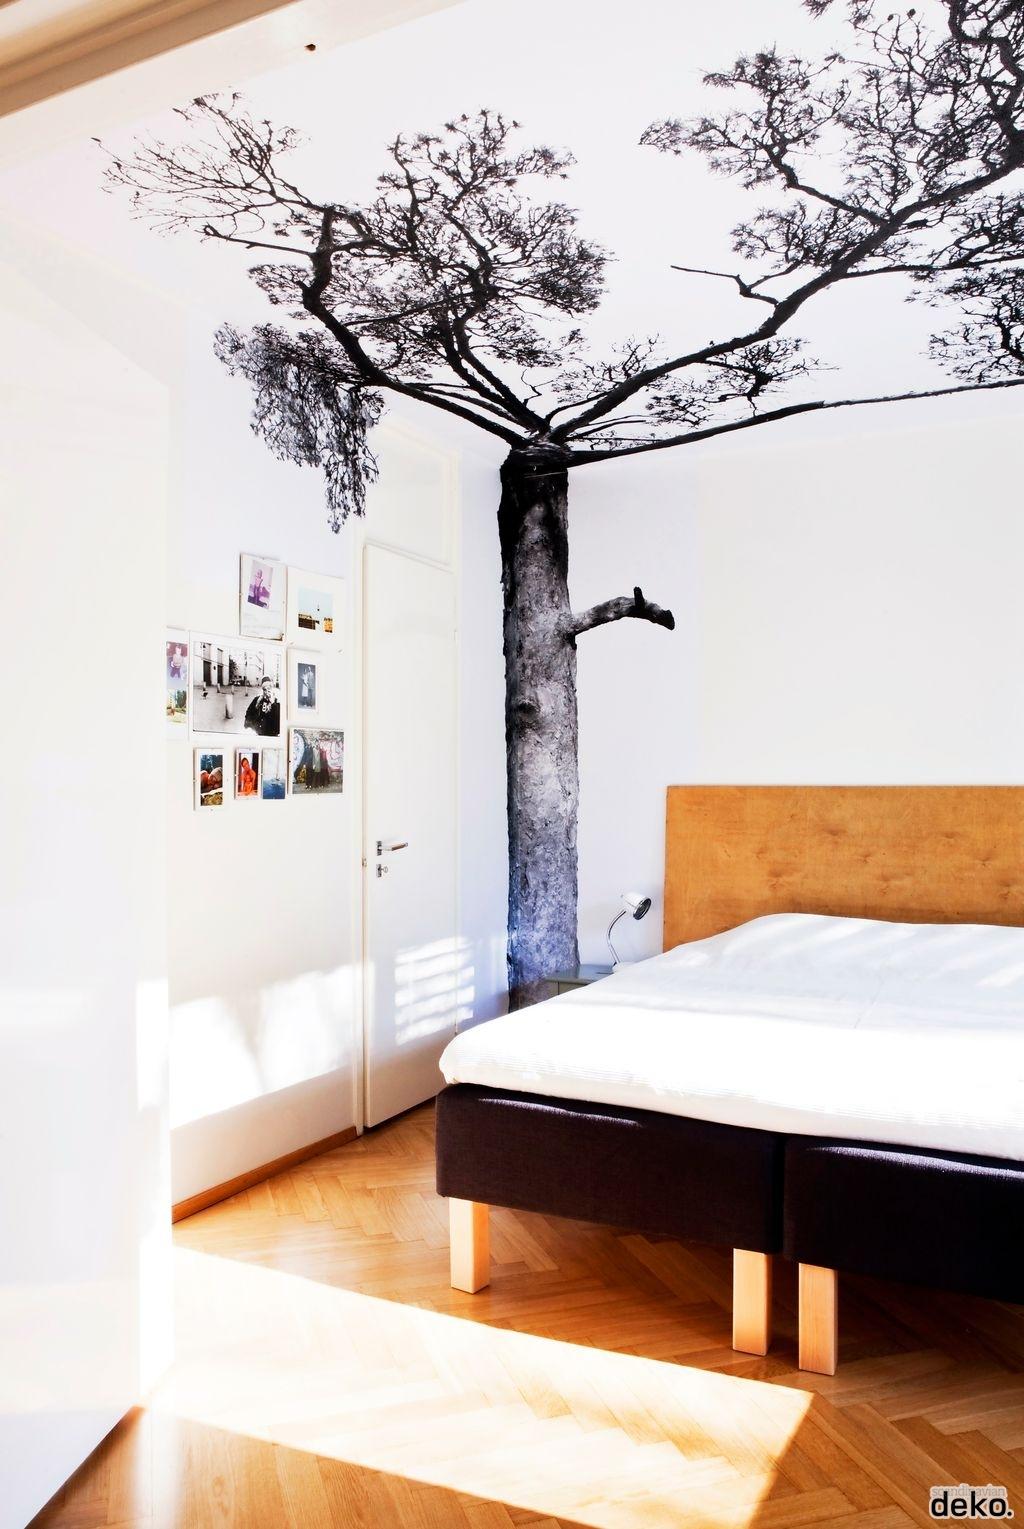 Koradecora arboles en las paredes for Skandinavien deko